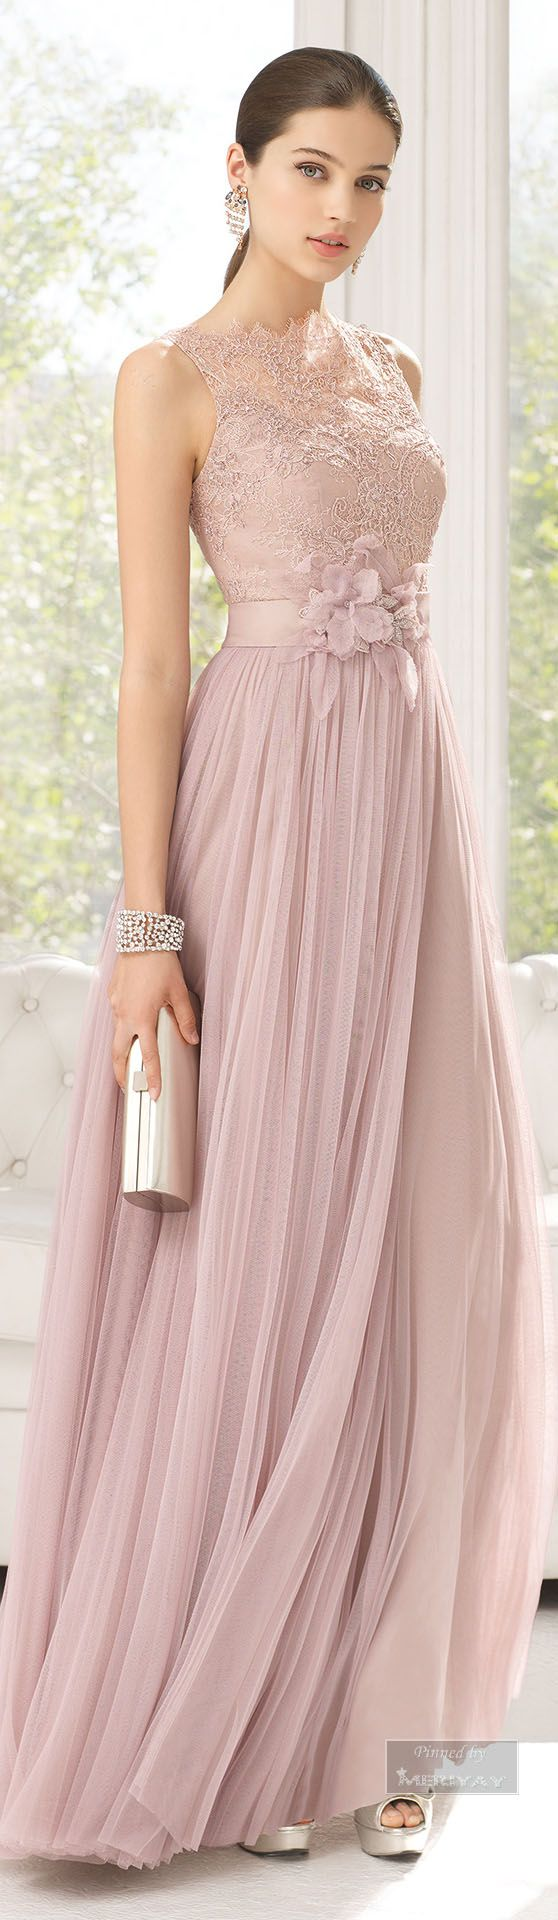 Mama june wedding dress  Aire Barcelona LadyLuxuryDesigns  moda para mujeres de